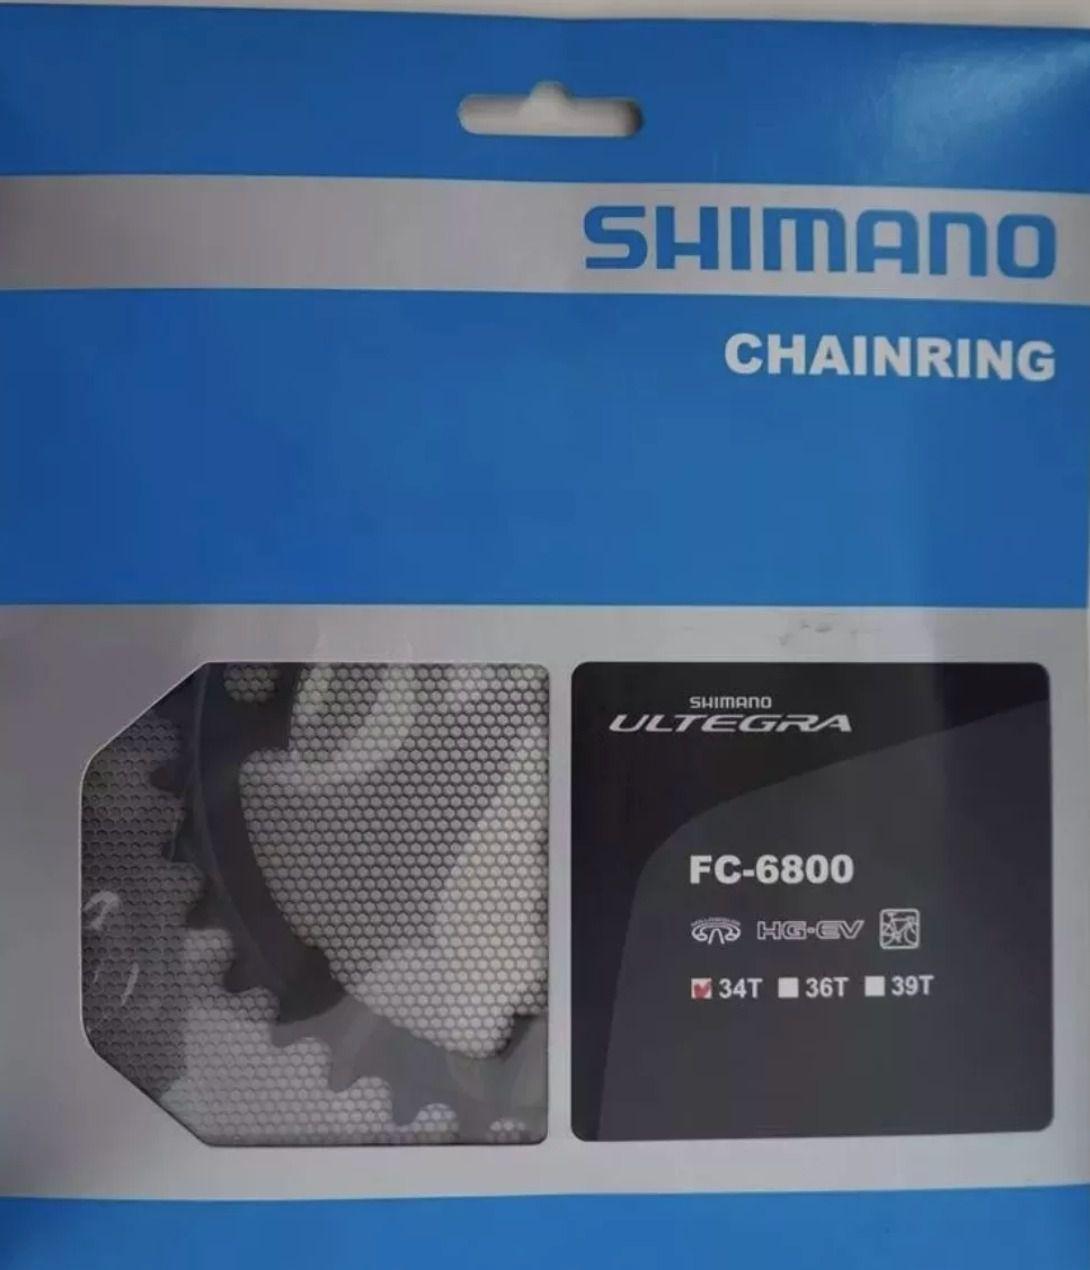 Coroa Shimano Ultegra Fc-6800 34 Dentes Bcd 110mm 11v